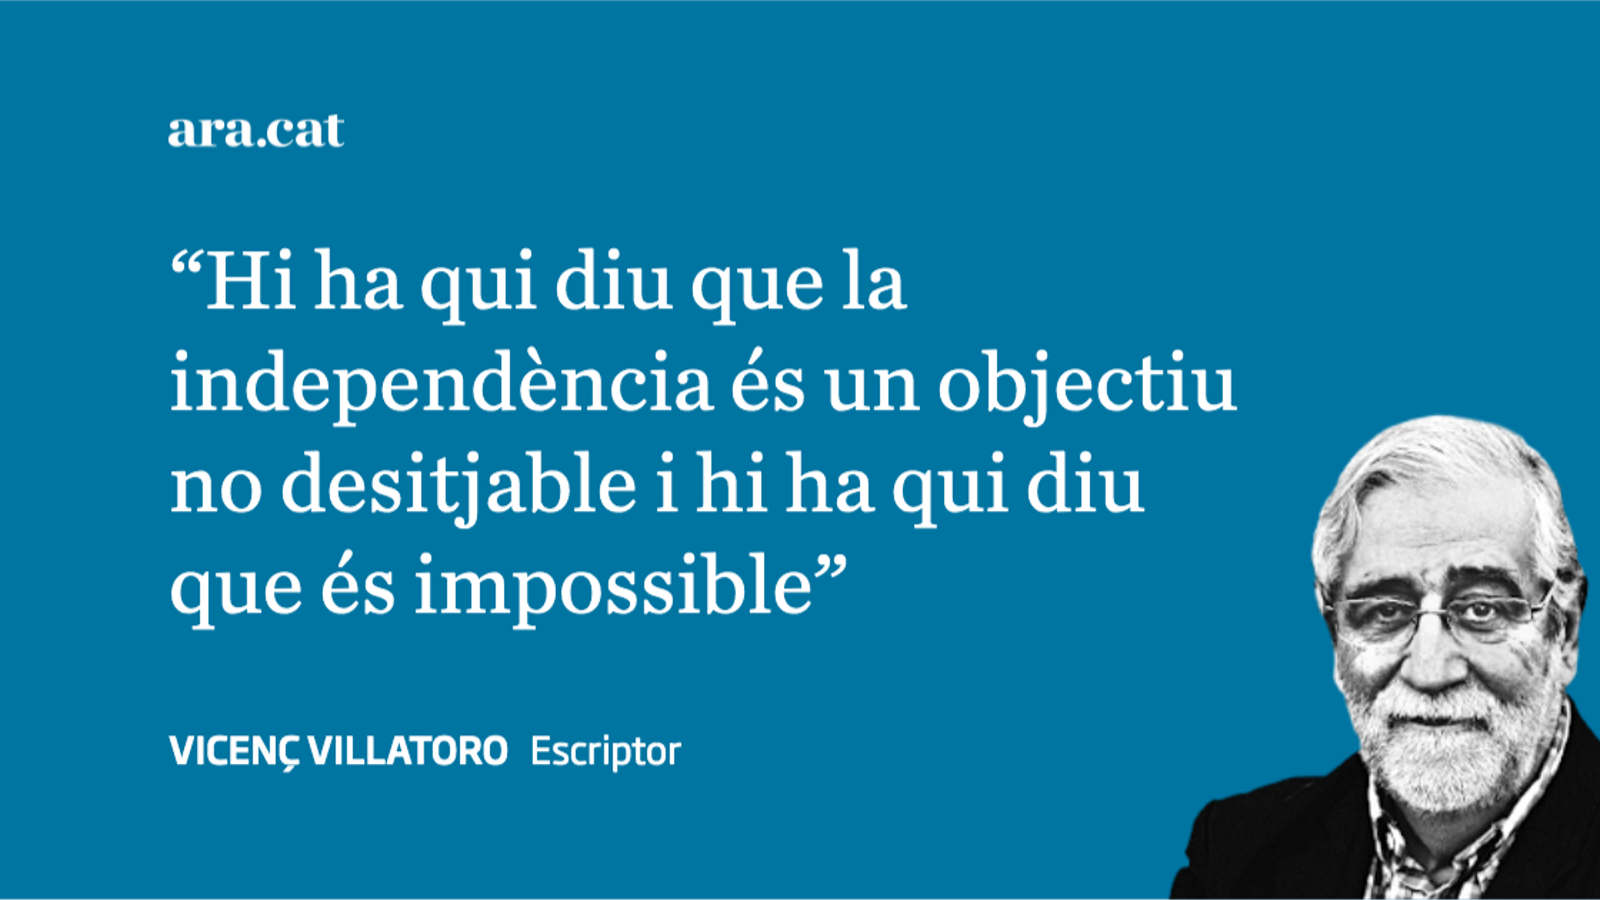 16/9: Contra l'impossible